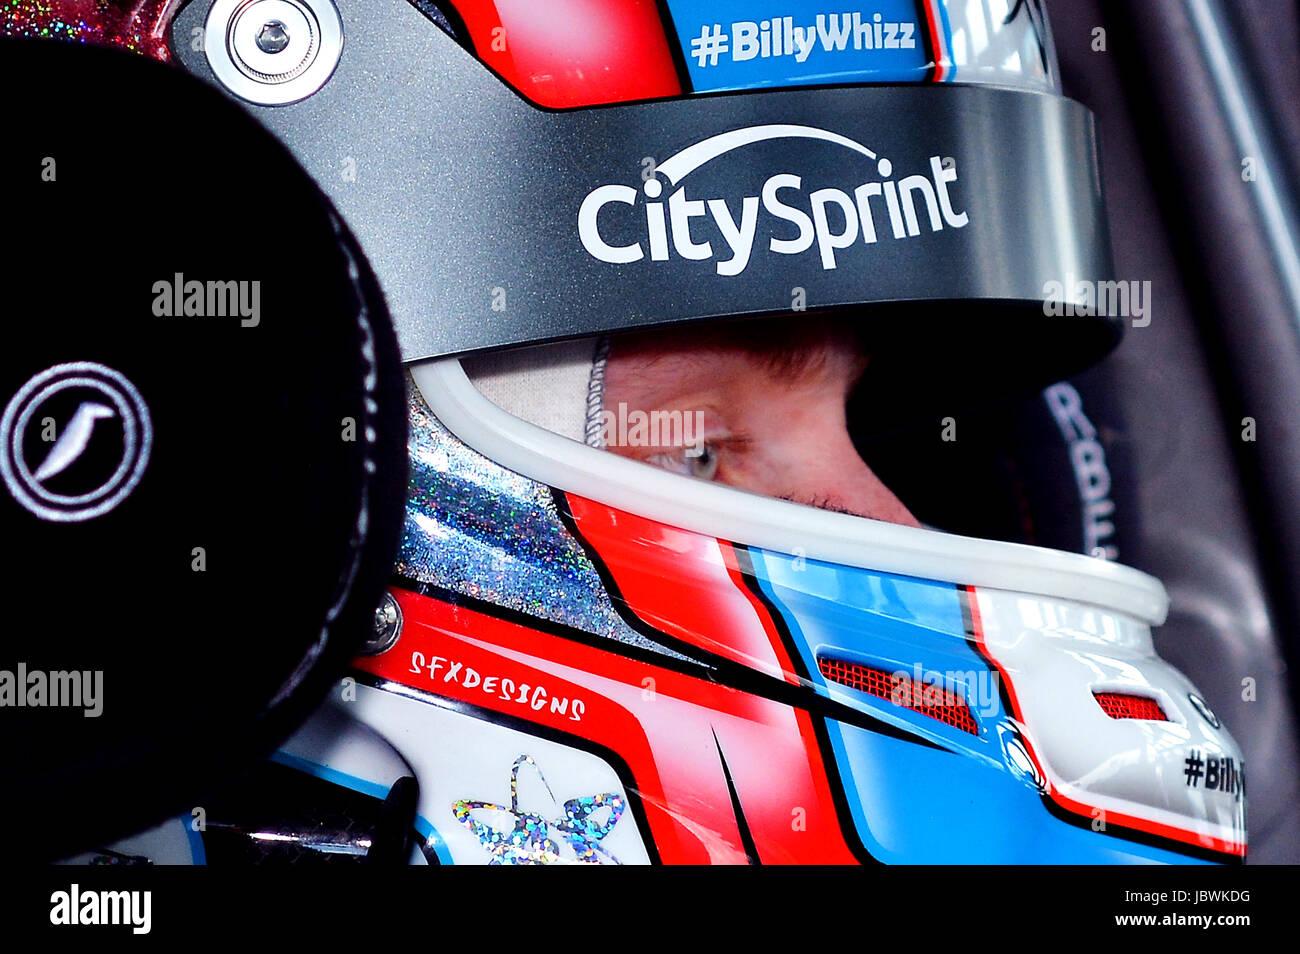 Dunlop MSA British Touring Car Championship, Adam Flux, driving a Subaru - Stock Image